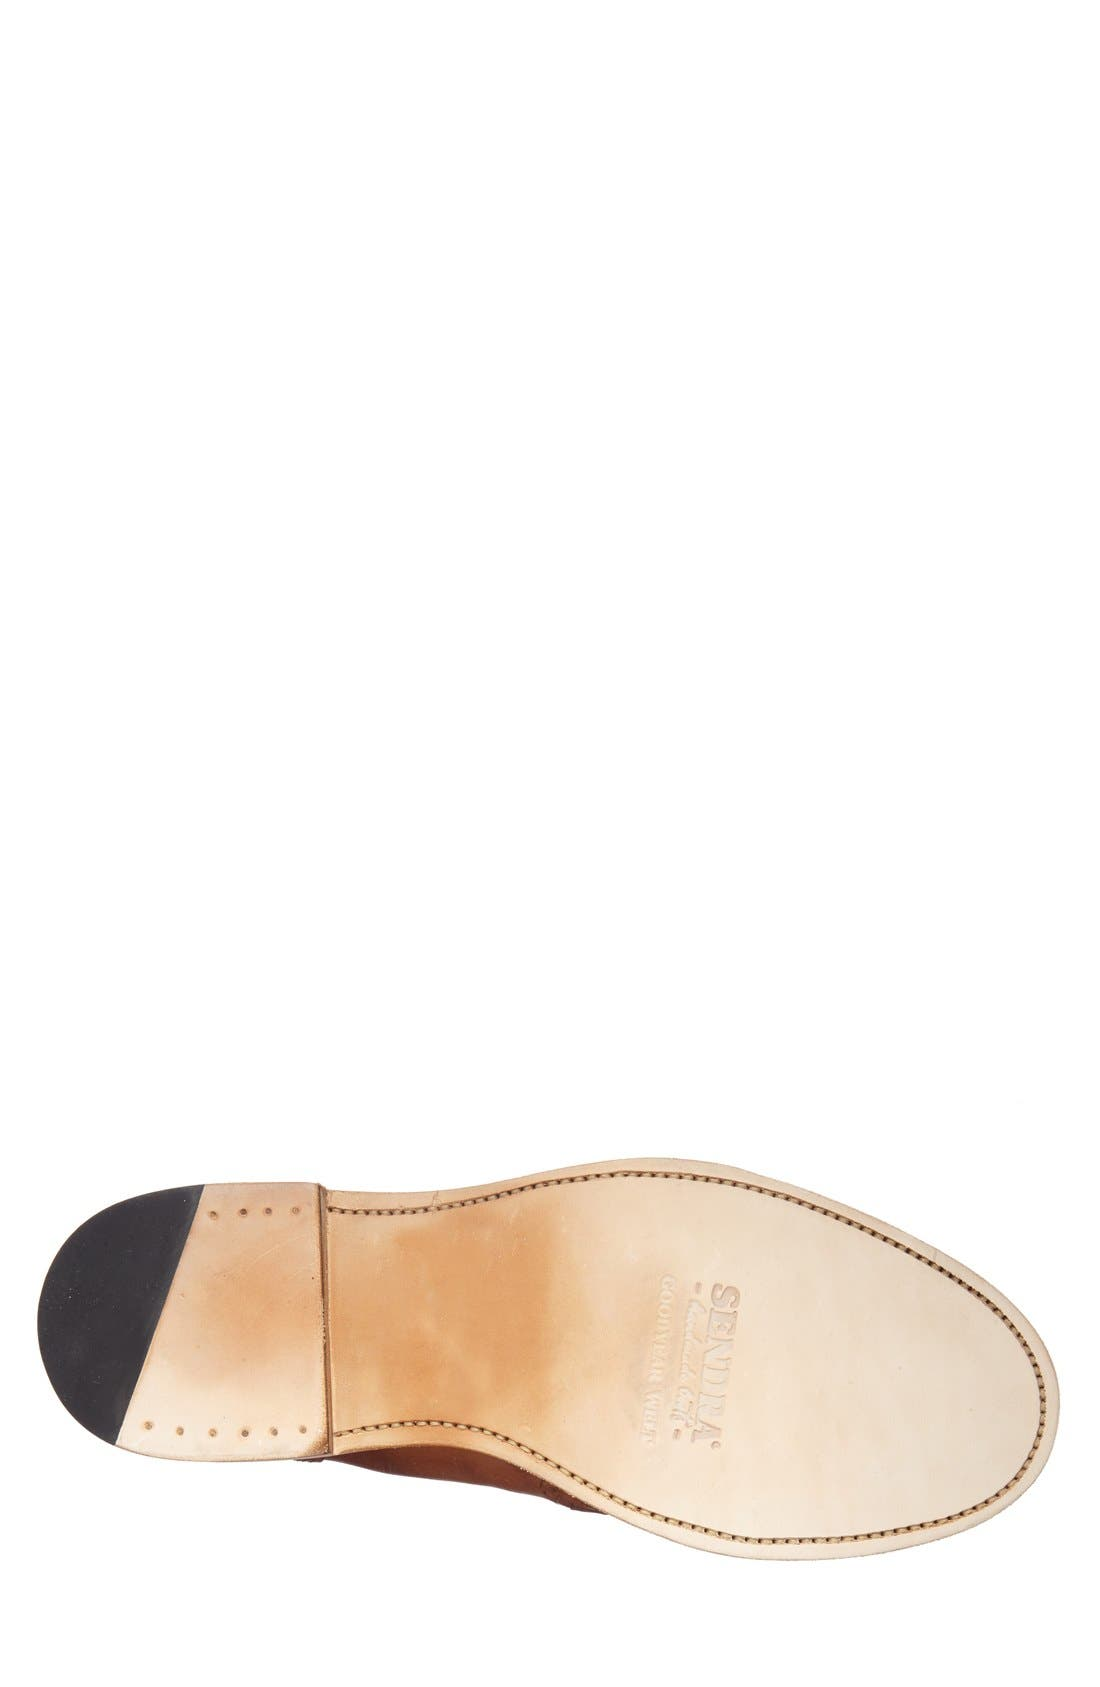 Boots 'Noris' Chukka Boot,                             Alternate thumbnail 4, color,                             Evolution Tan